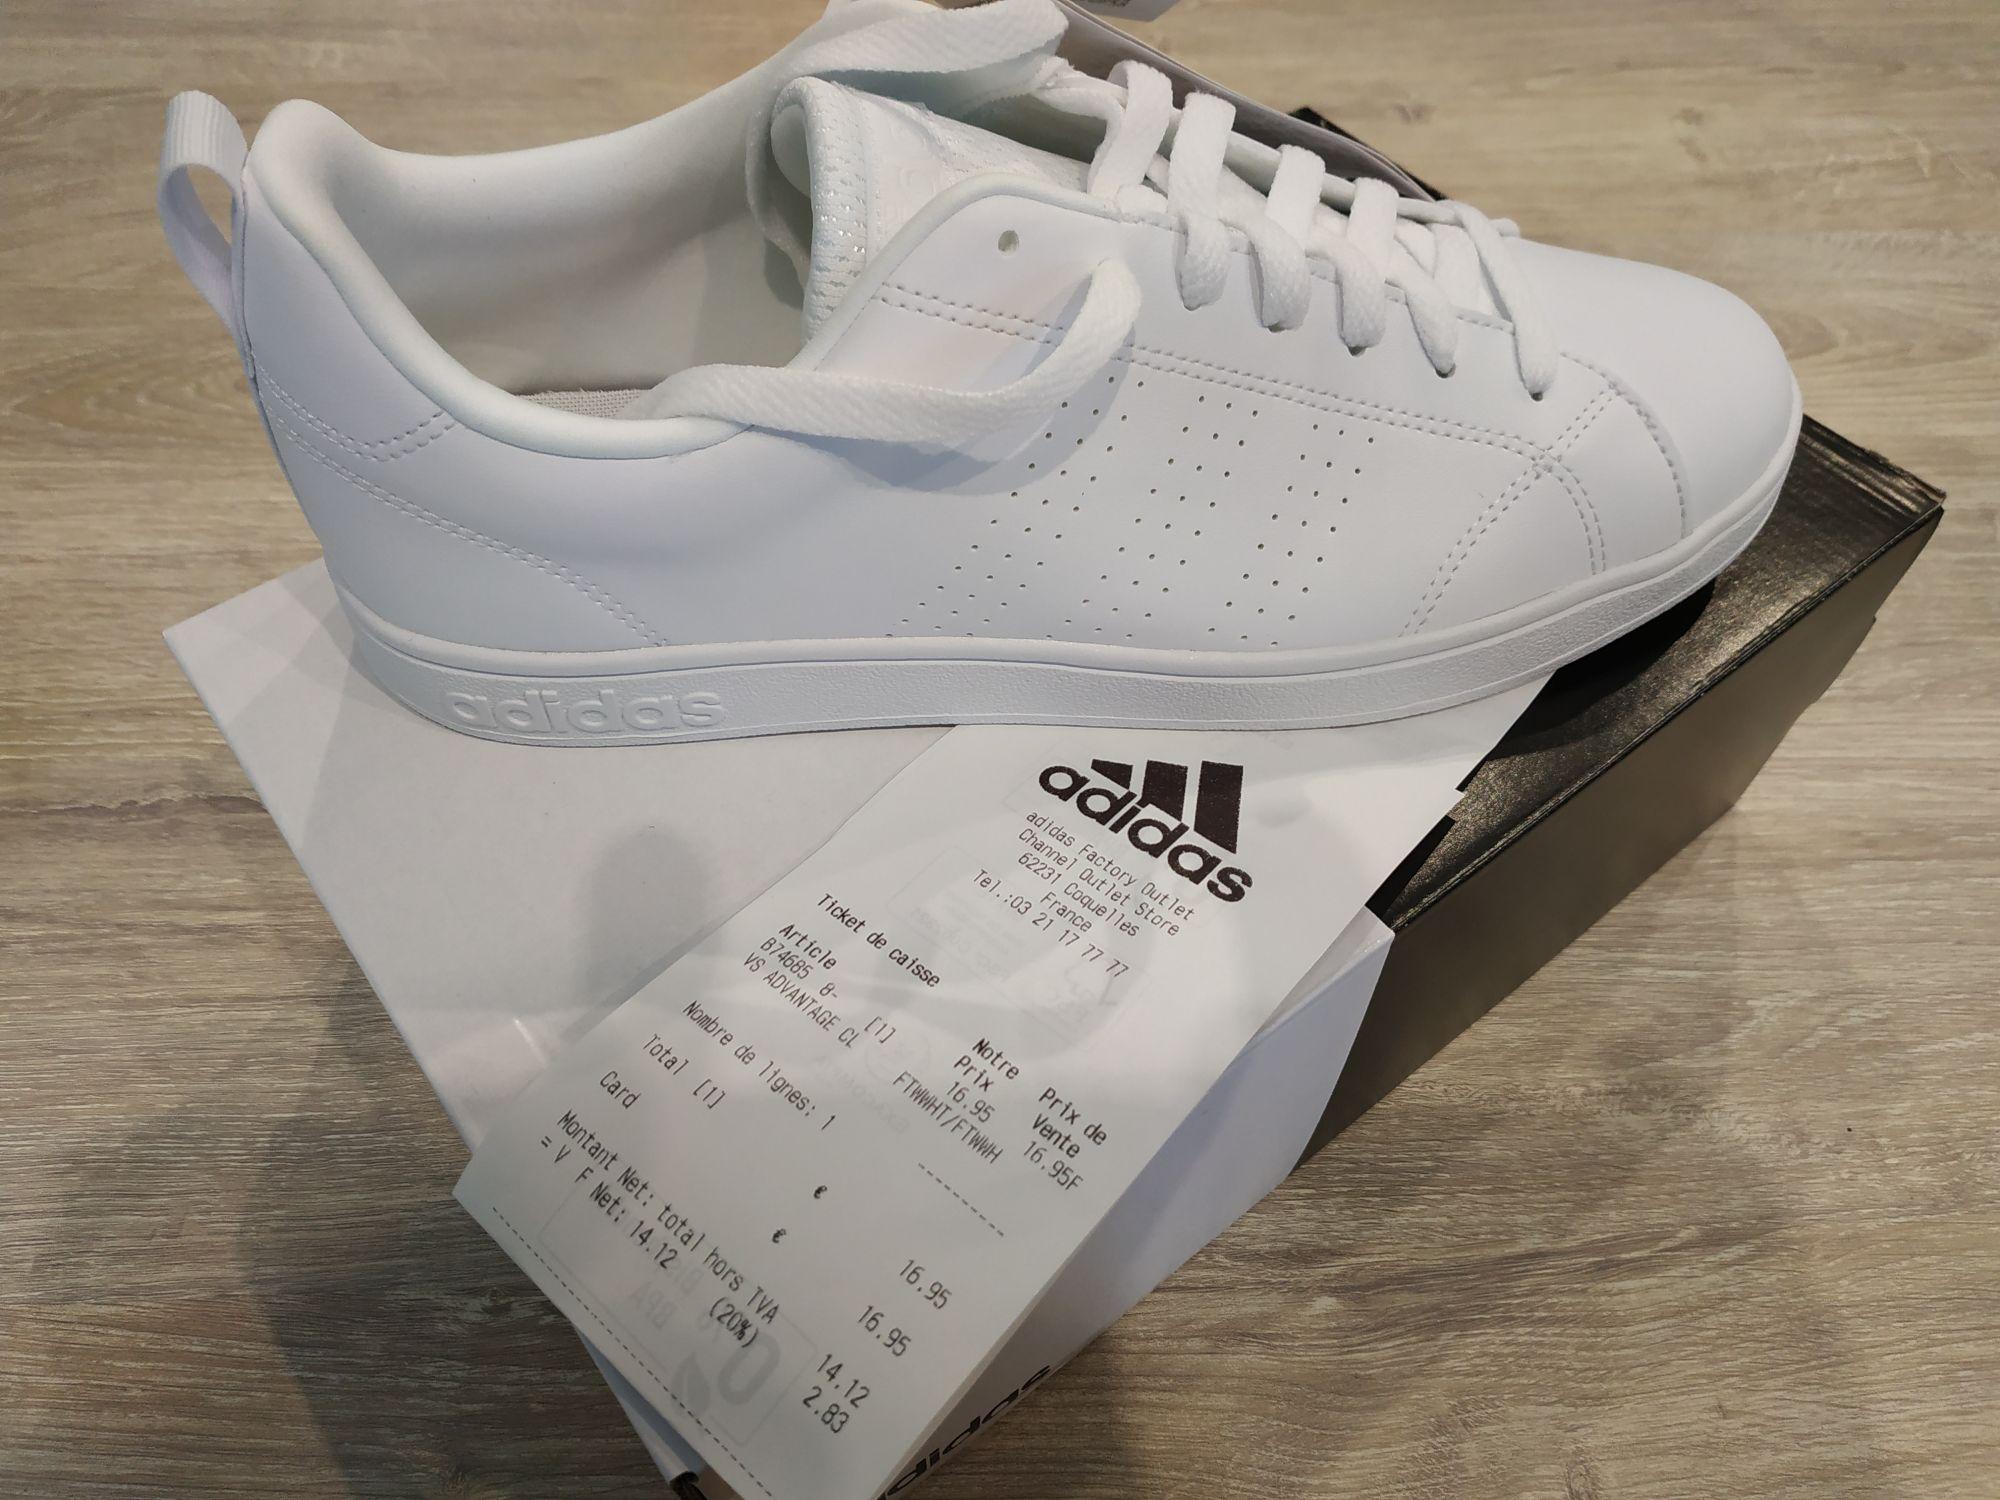 Baskets Adidas VS Advantage - Taille 42 2/3 - Adidas Factory Outlet Coquelles (62)